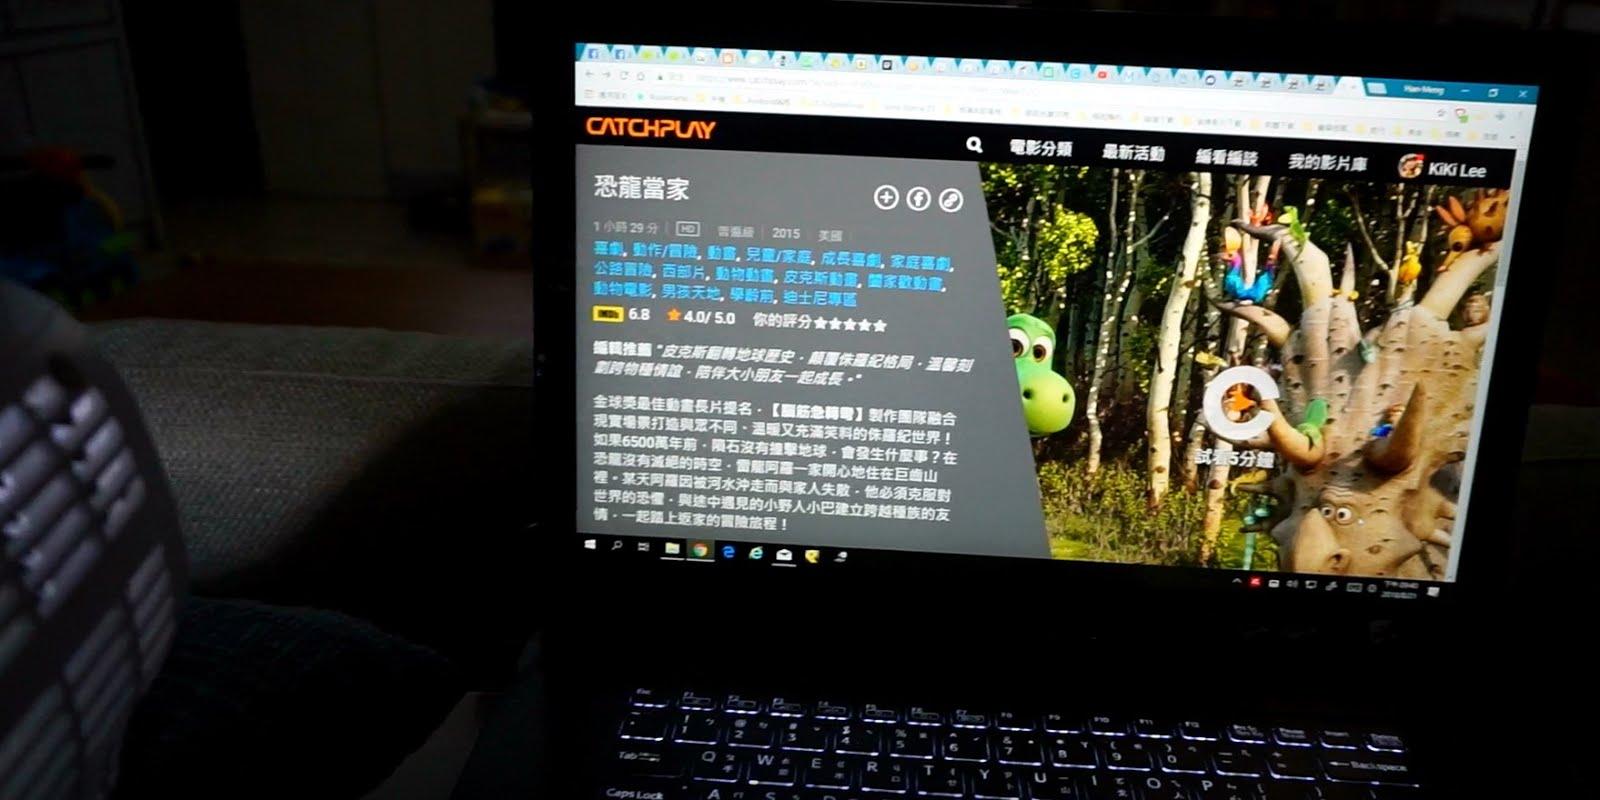 BenQ4KHDR_dj%25E7%2590%25A6%25E7%2590%25A6_wwwhostkikicom_catchplay.jpg-戀家人時光,創造另一種浪漫  |BenQ 4K HDR 投影機